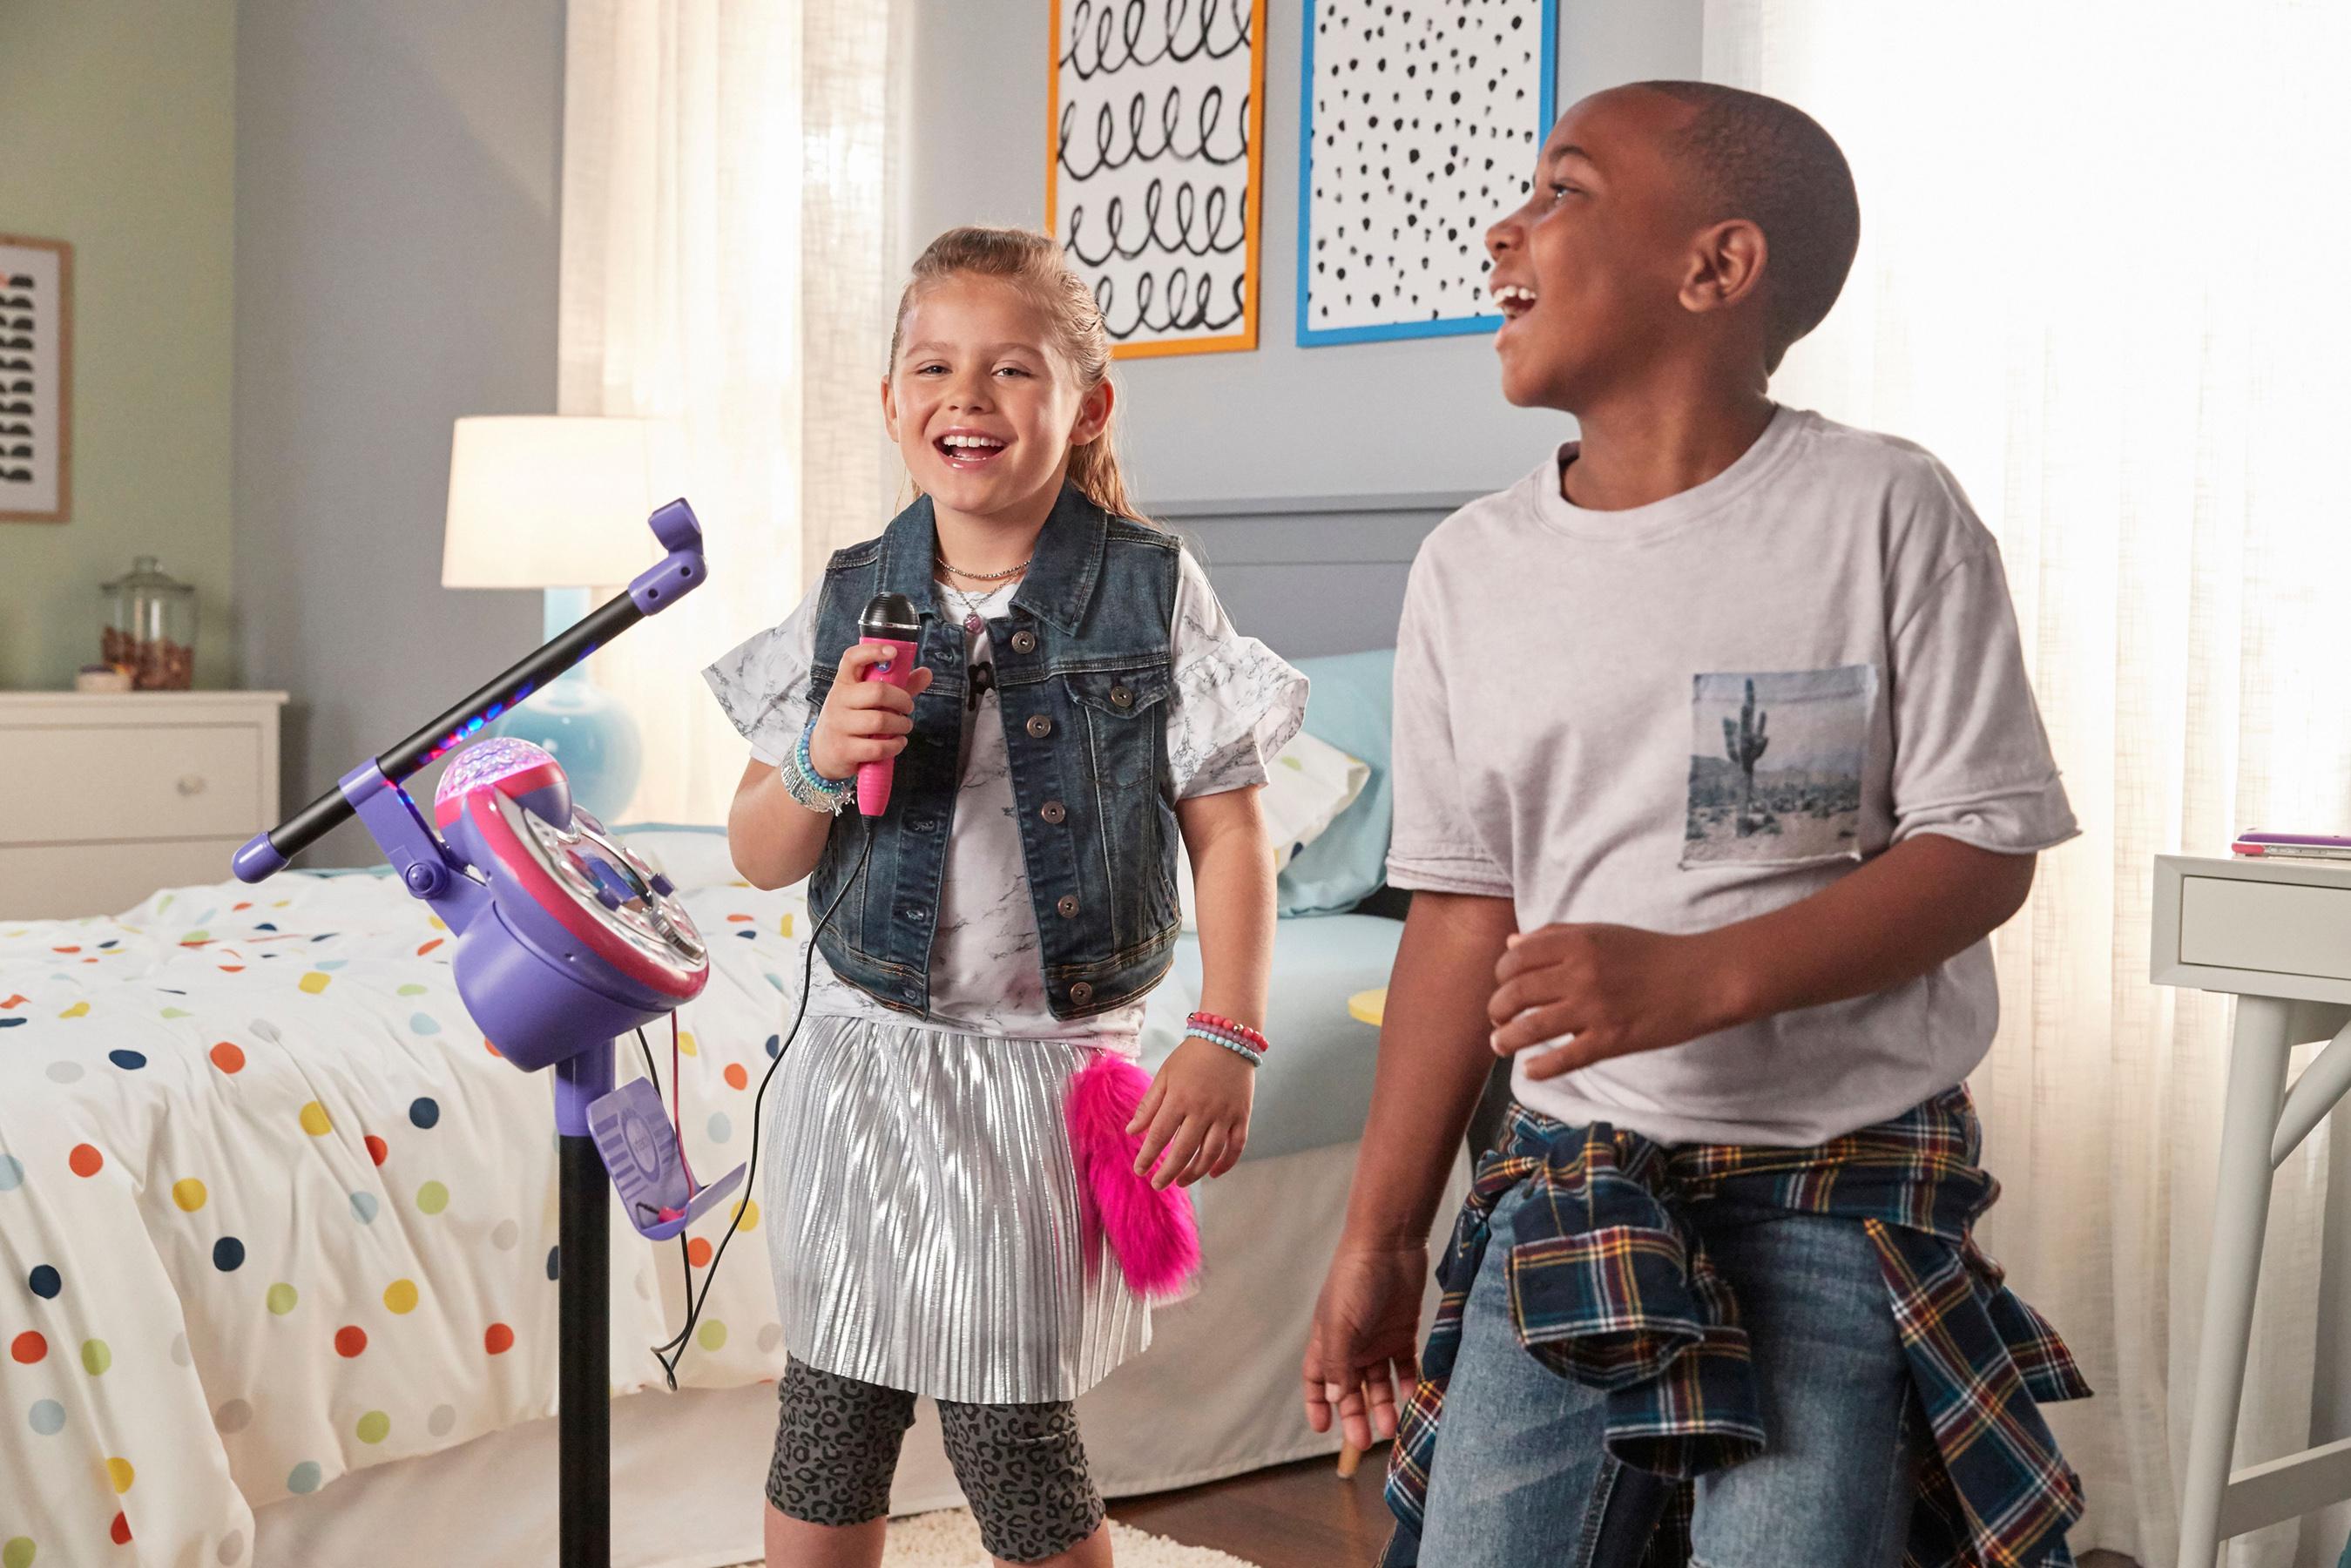 VTech® Puts Kids in the Spotlight with New Kidi Star Karaoke